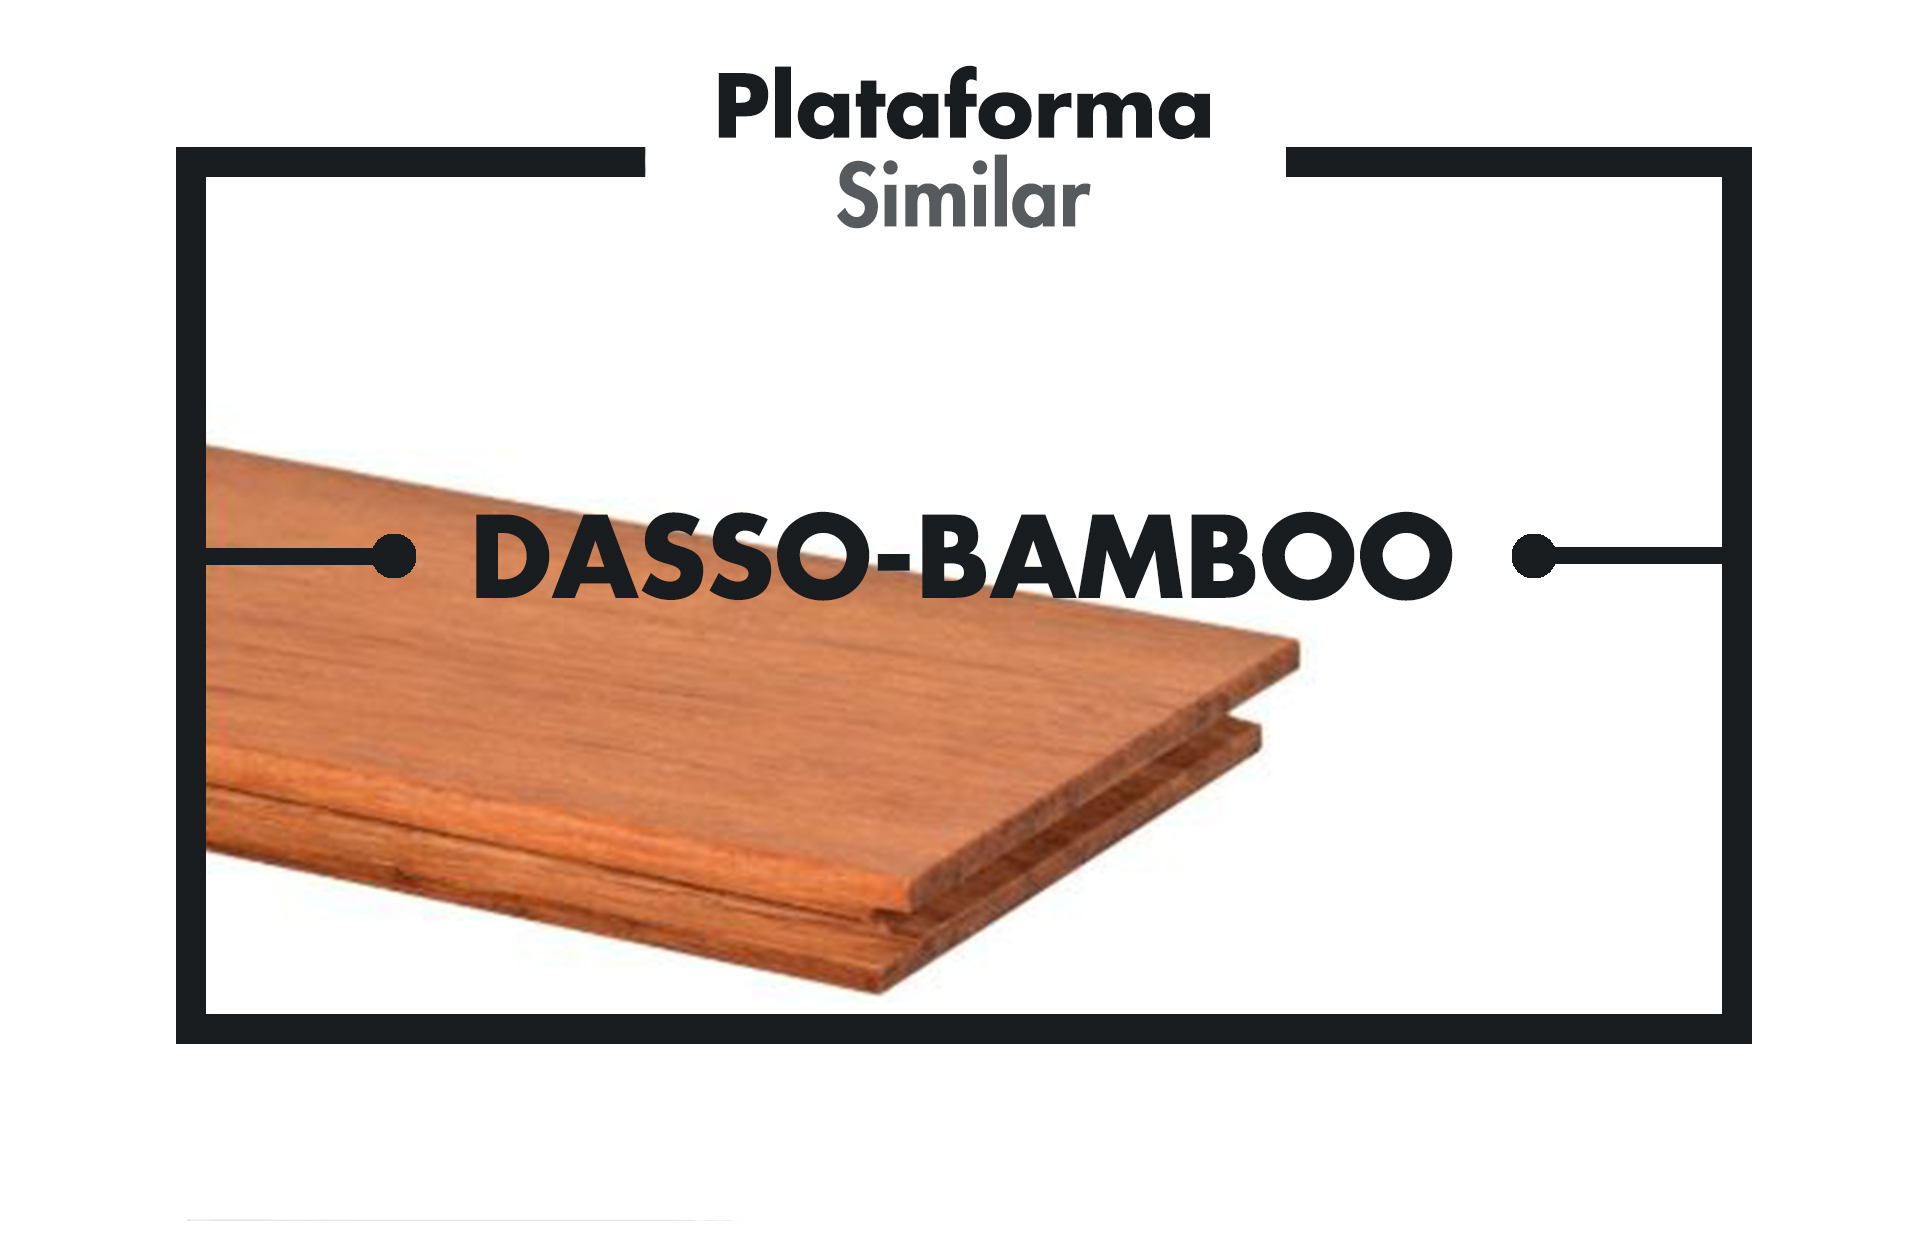 dasso-bamboo